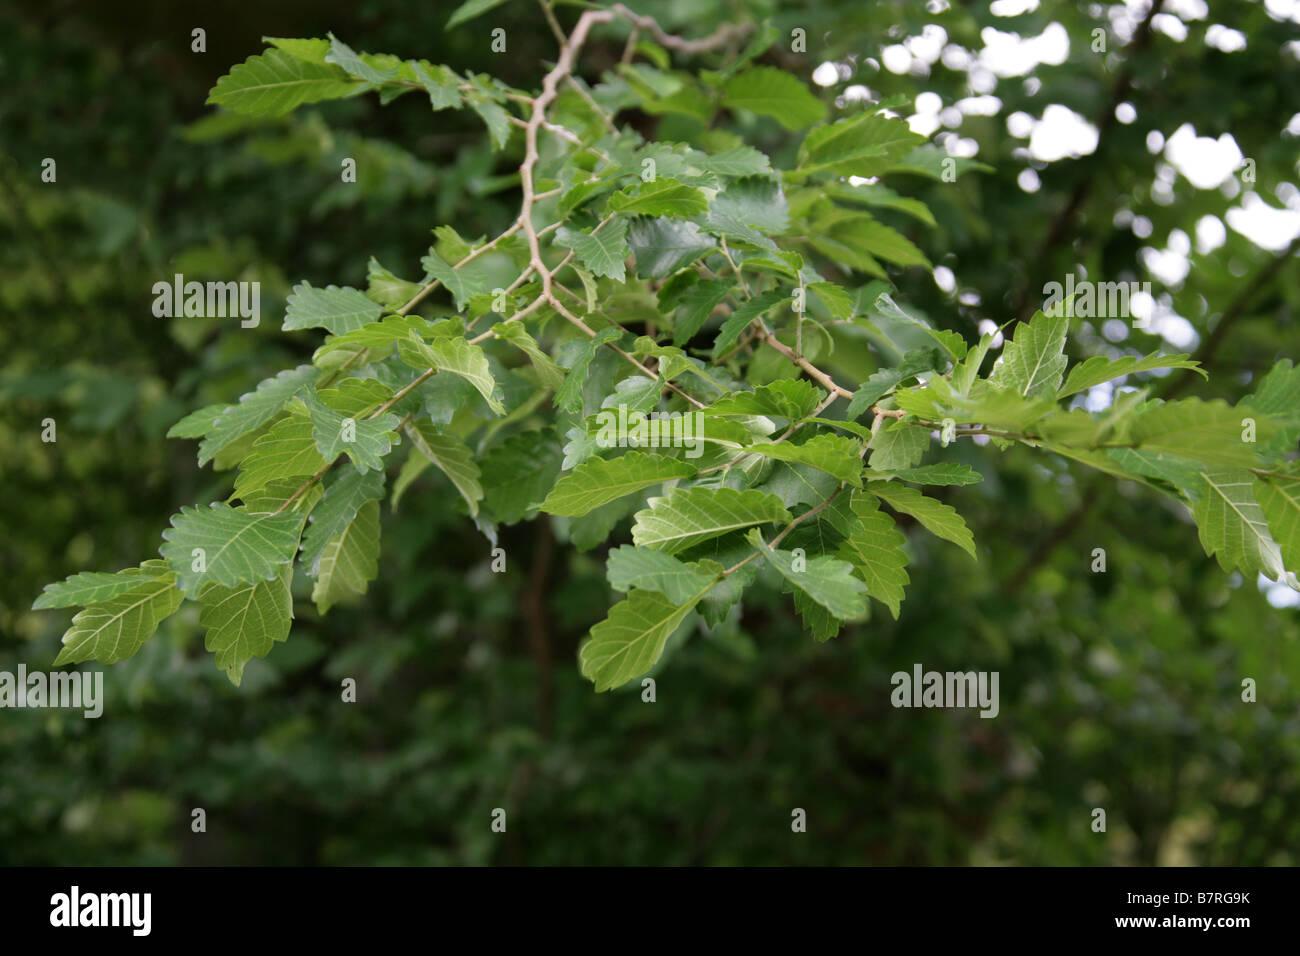 Caucasian Elm, Zelkova or Caucasian Zelkova, Zelkova carpinifolia, Ulmaceae, Turkey and Iran - Stock Image